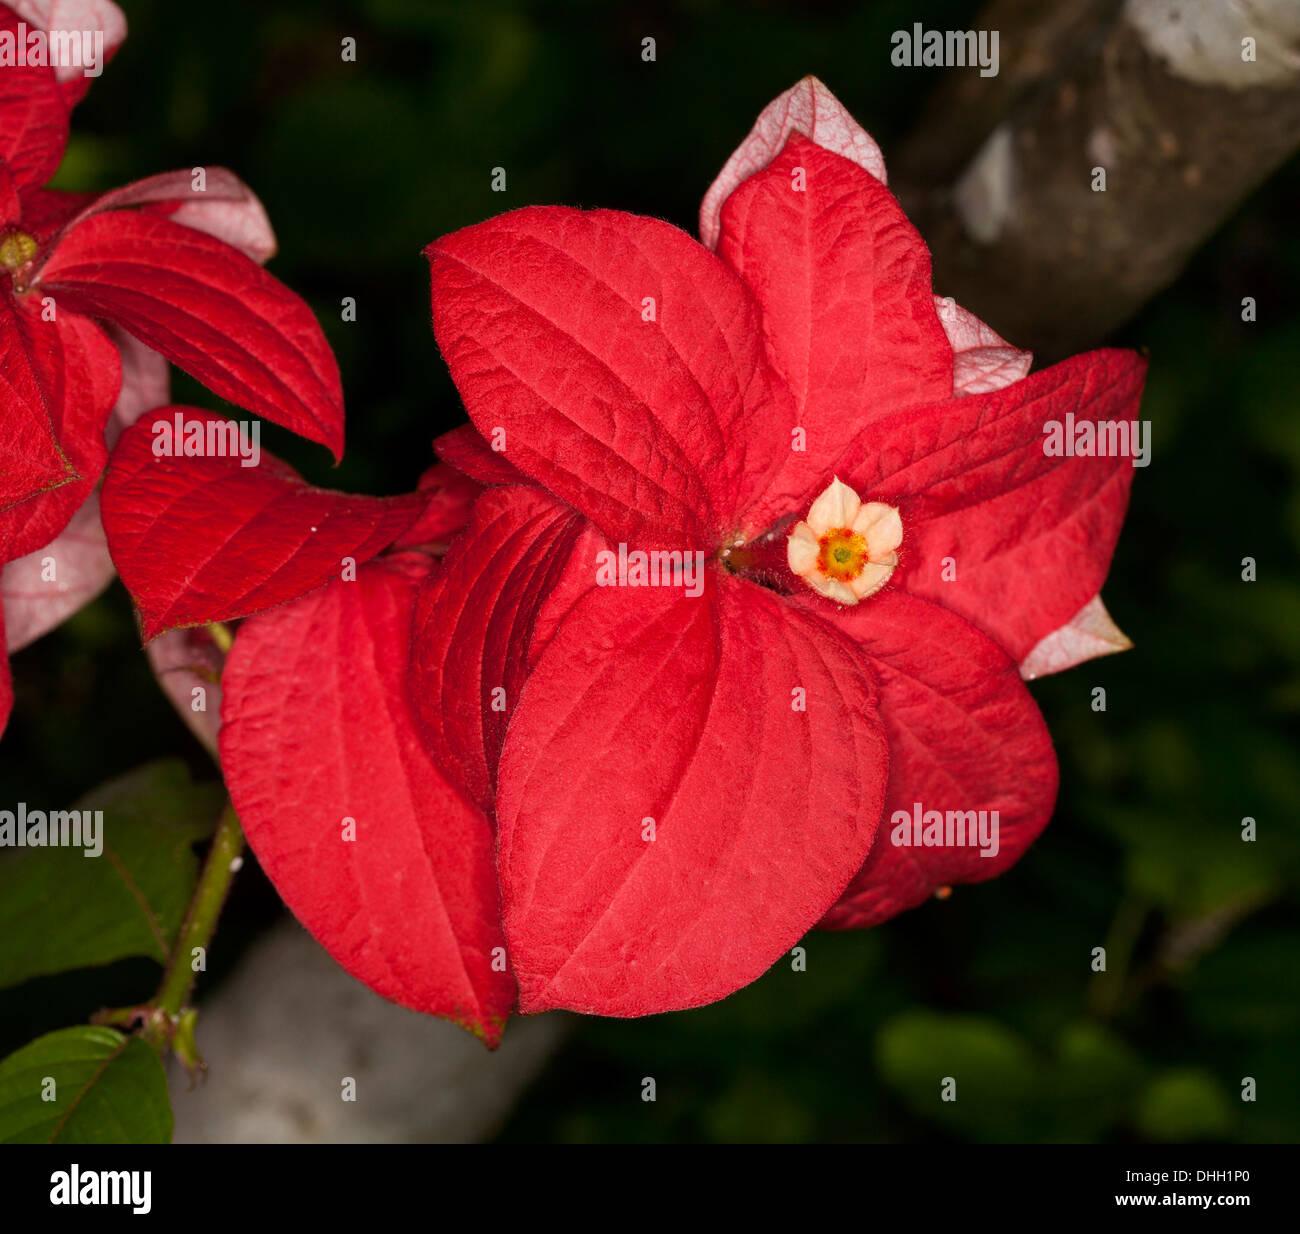 Spectacular bright red bracts and tiny white flower of new unusual spectacular bright red bracts and tiny white flower of new unusual cultivar of sub tropical shrub mussaenda capricorn dream mightylinksfo